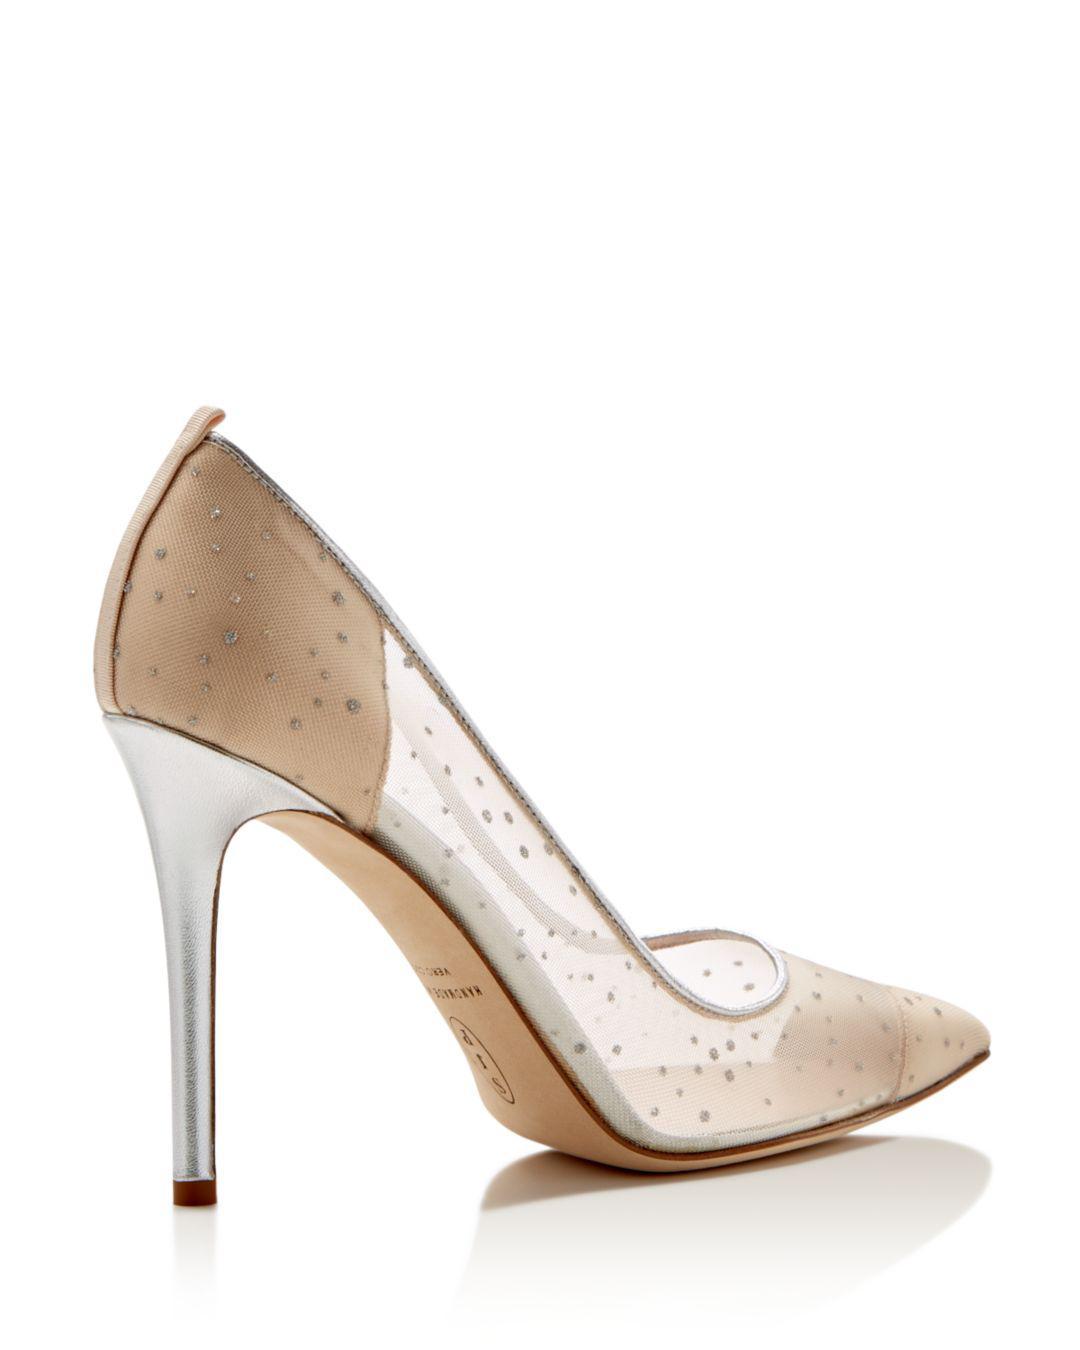 95ca9d5c1b5 Lyst - SJP by Sarah Jessica Parker Glass Glitter Dot Pointed Toe High-heel  Pumps in Metallic